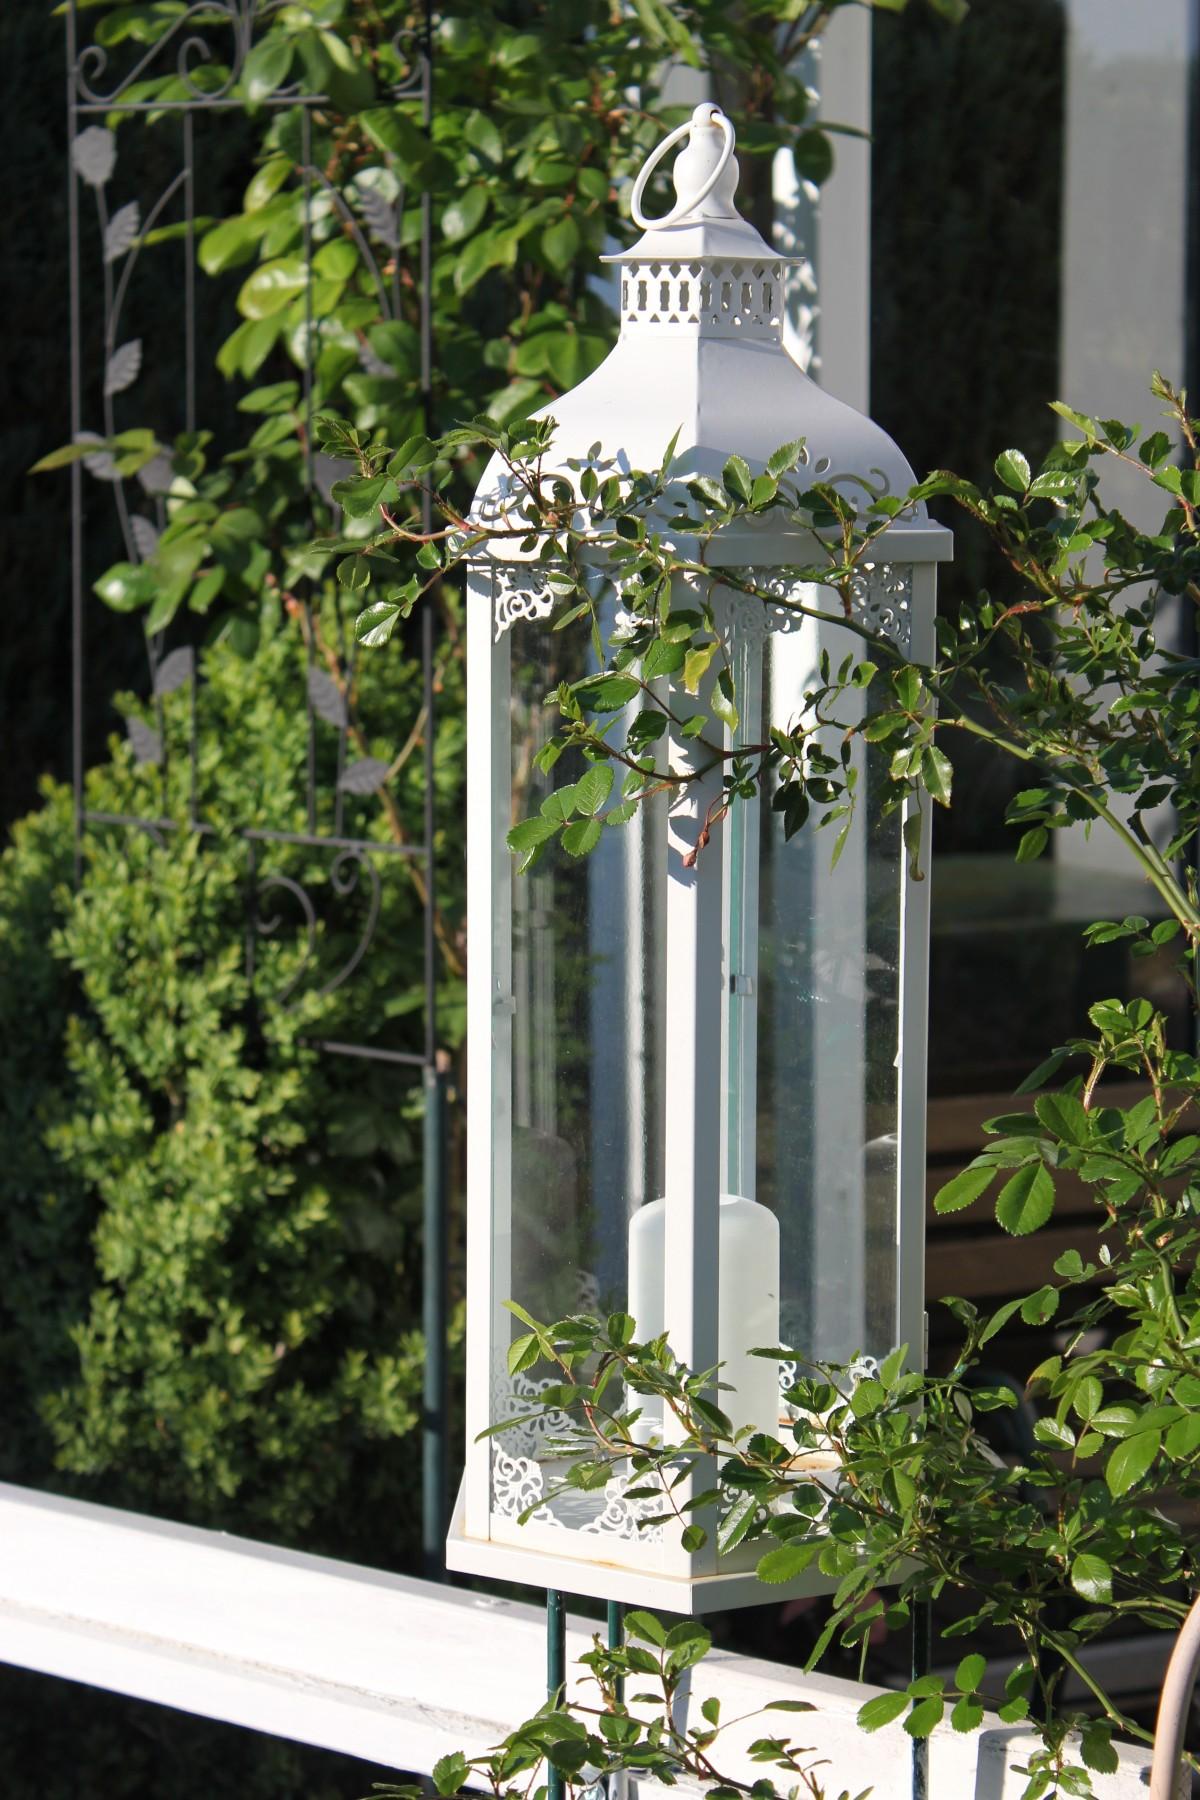 Kostenlose foto licht wei fenster atmosph re veranda dekoration laterne romantik - Laterne garten kerze ...